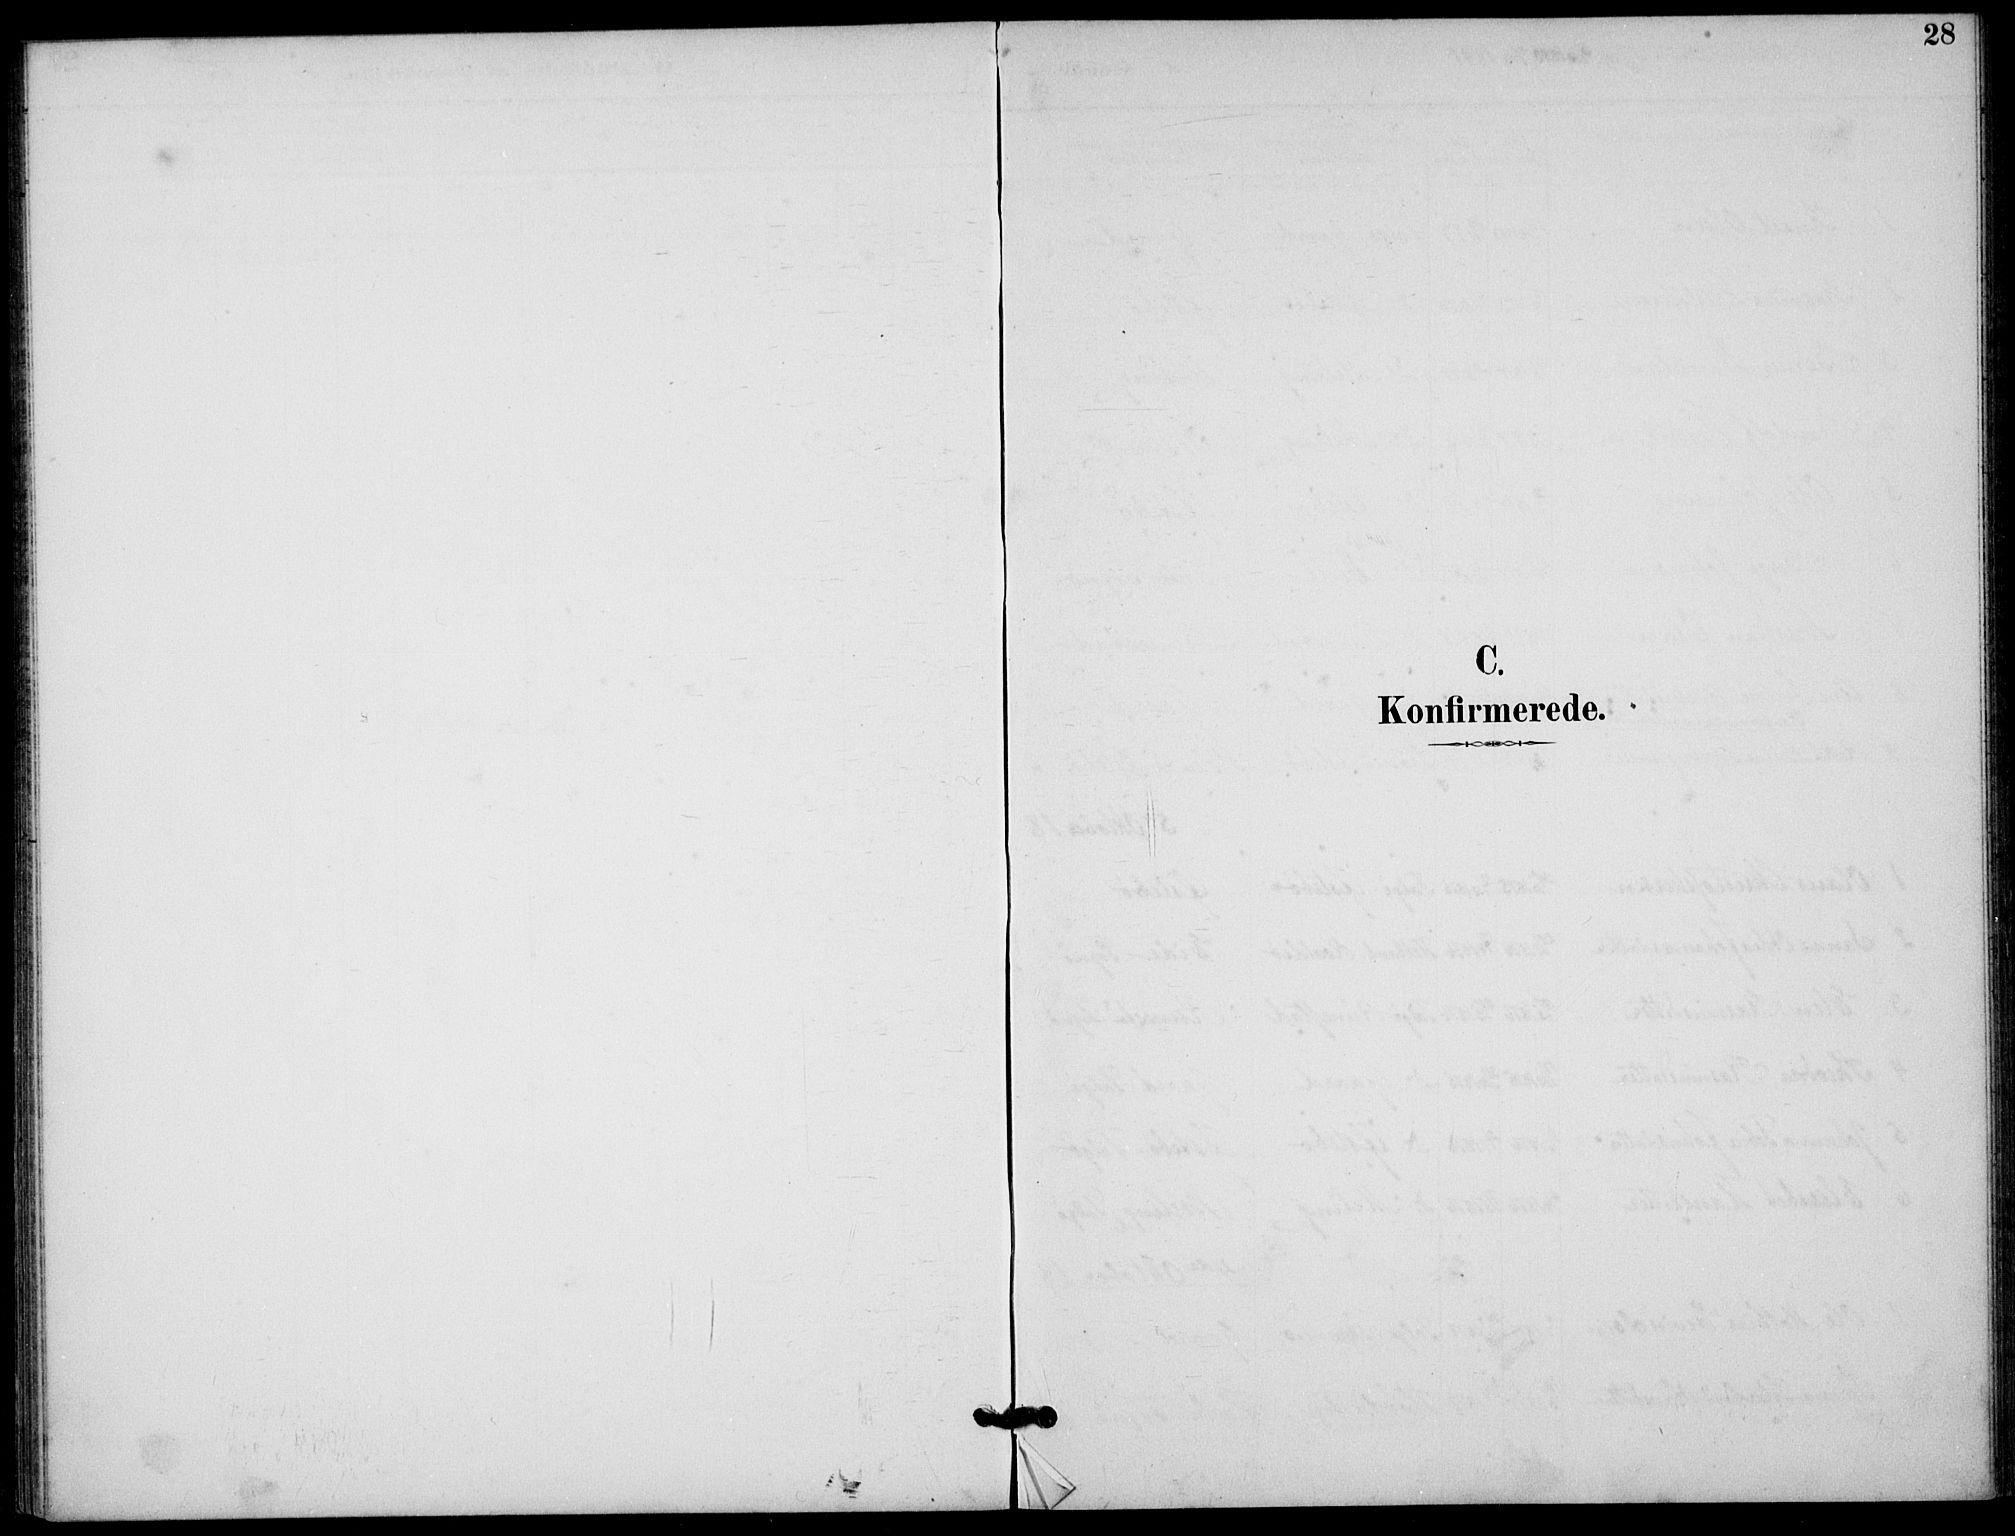 SAST, Finnøy sokneprestkontor, H/Ha/Haa/L0012: Ministerialbok nr. A 12, 1889-1917, s. 28